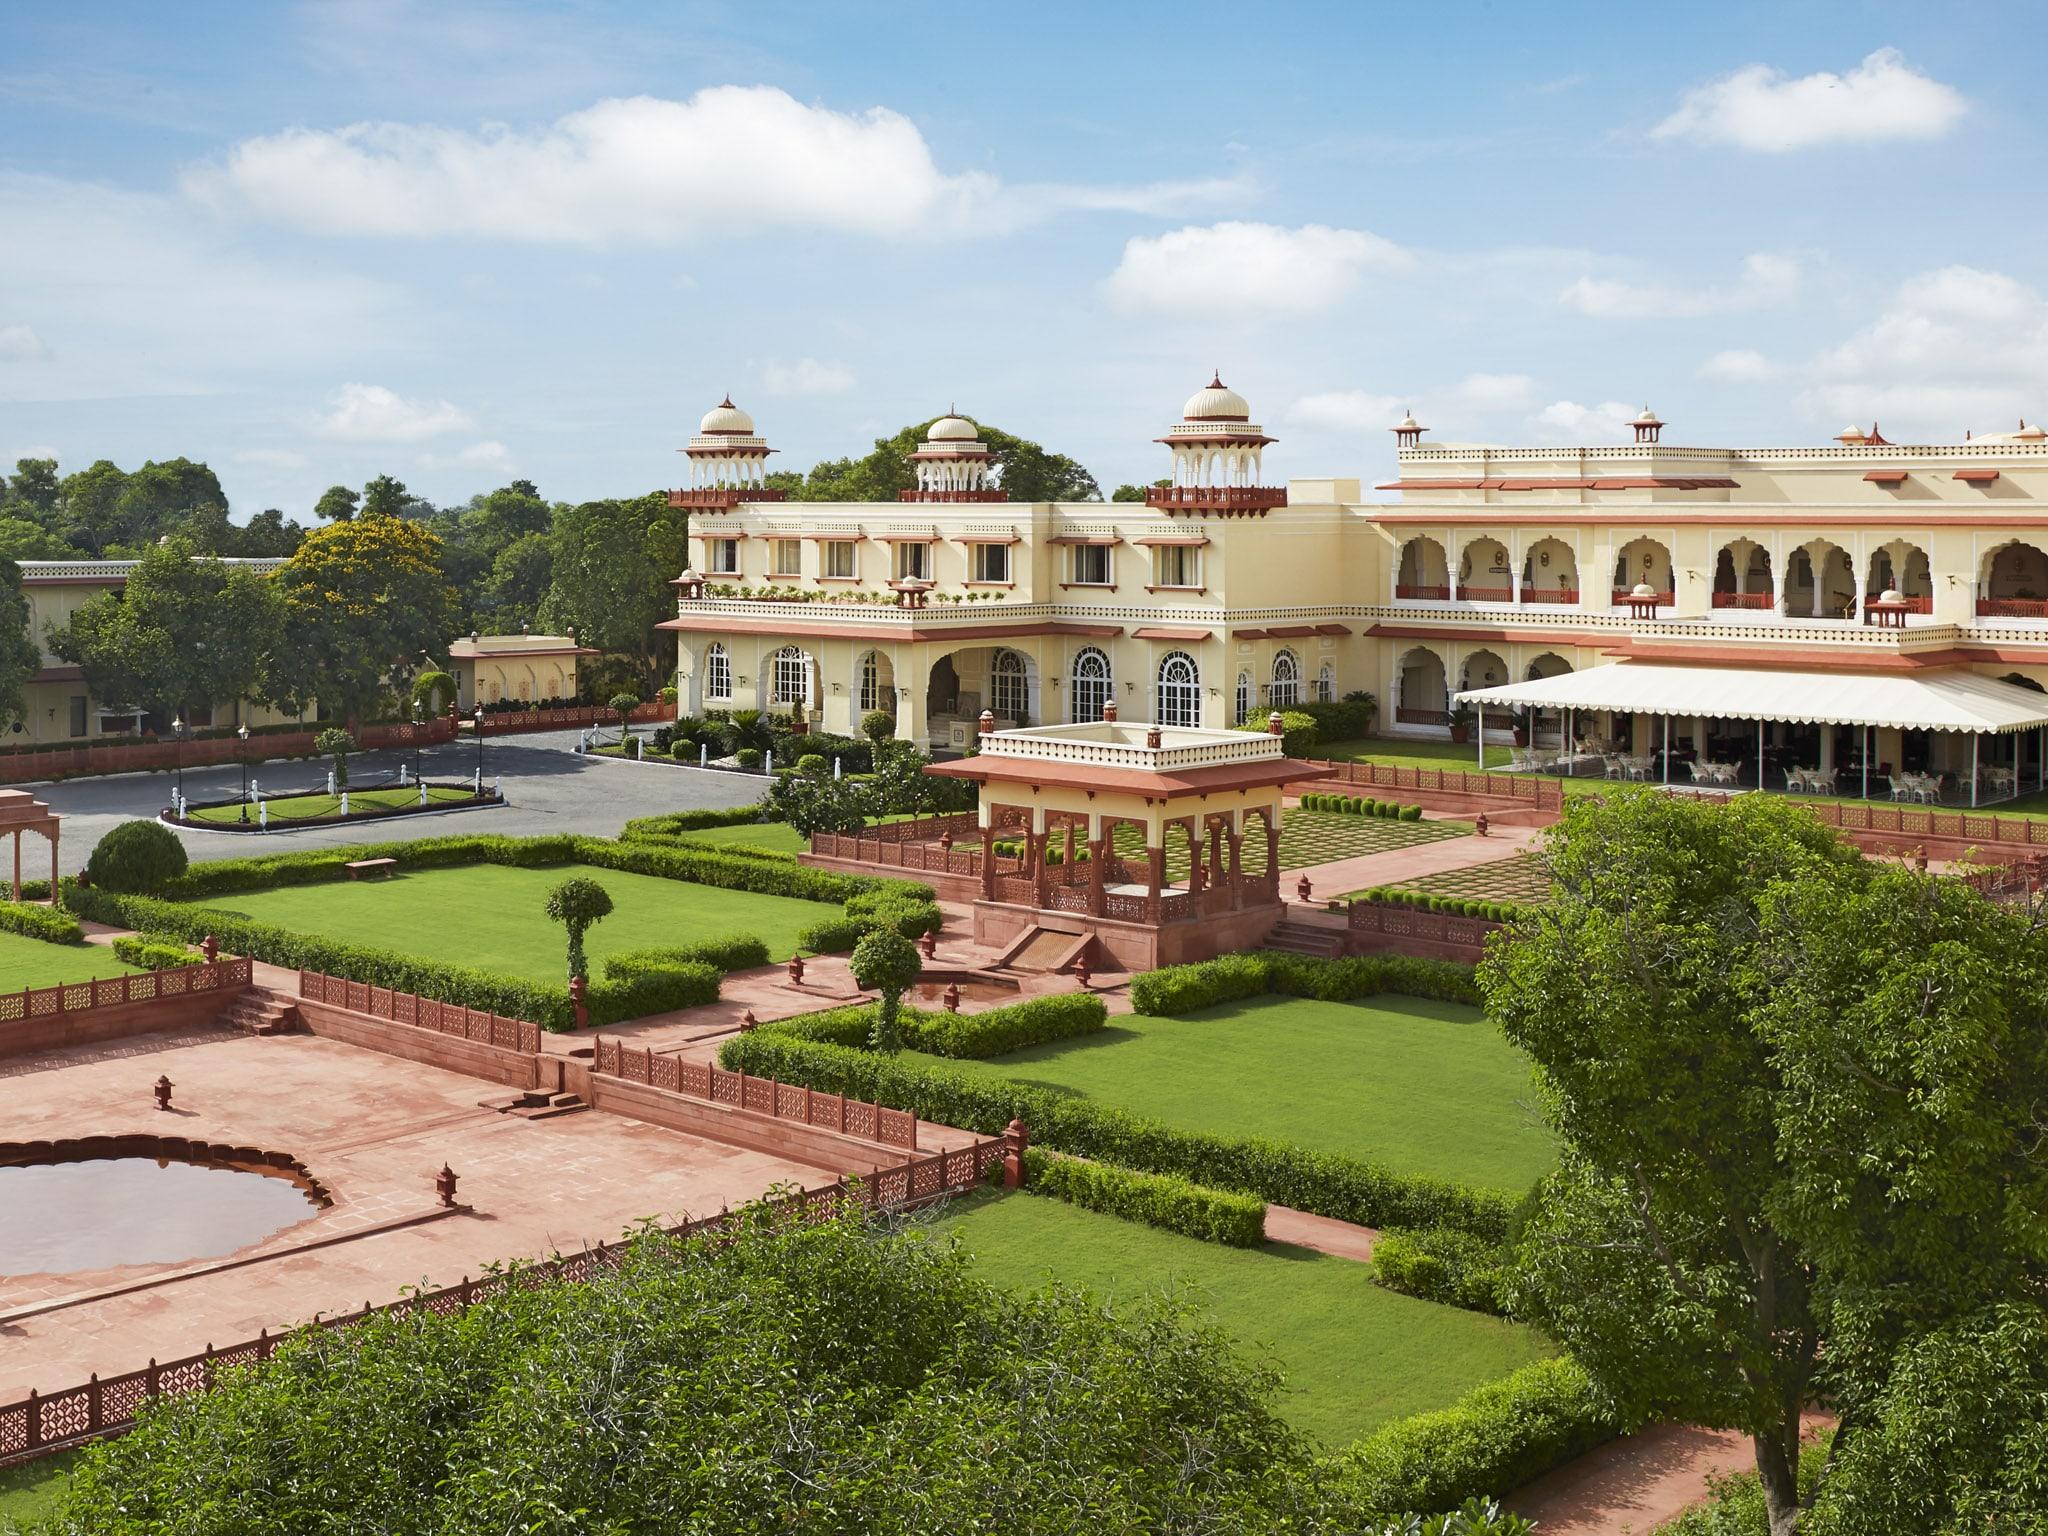 Luxury Business Hotel In Bangalore Taj Yeshwantpur Bengaluru - Bangalore-taj-hotels-the-happening-landmark-of-the-city